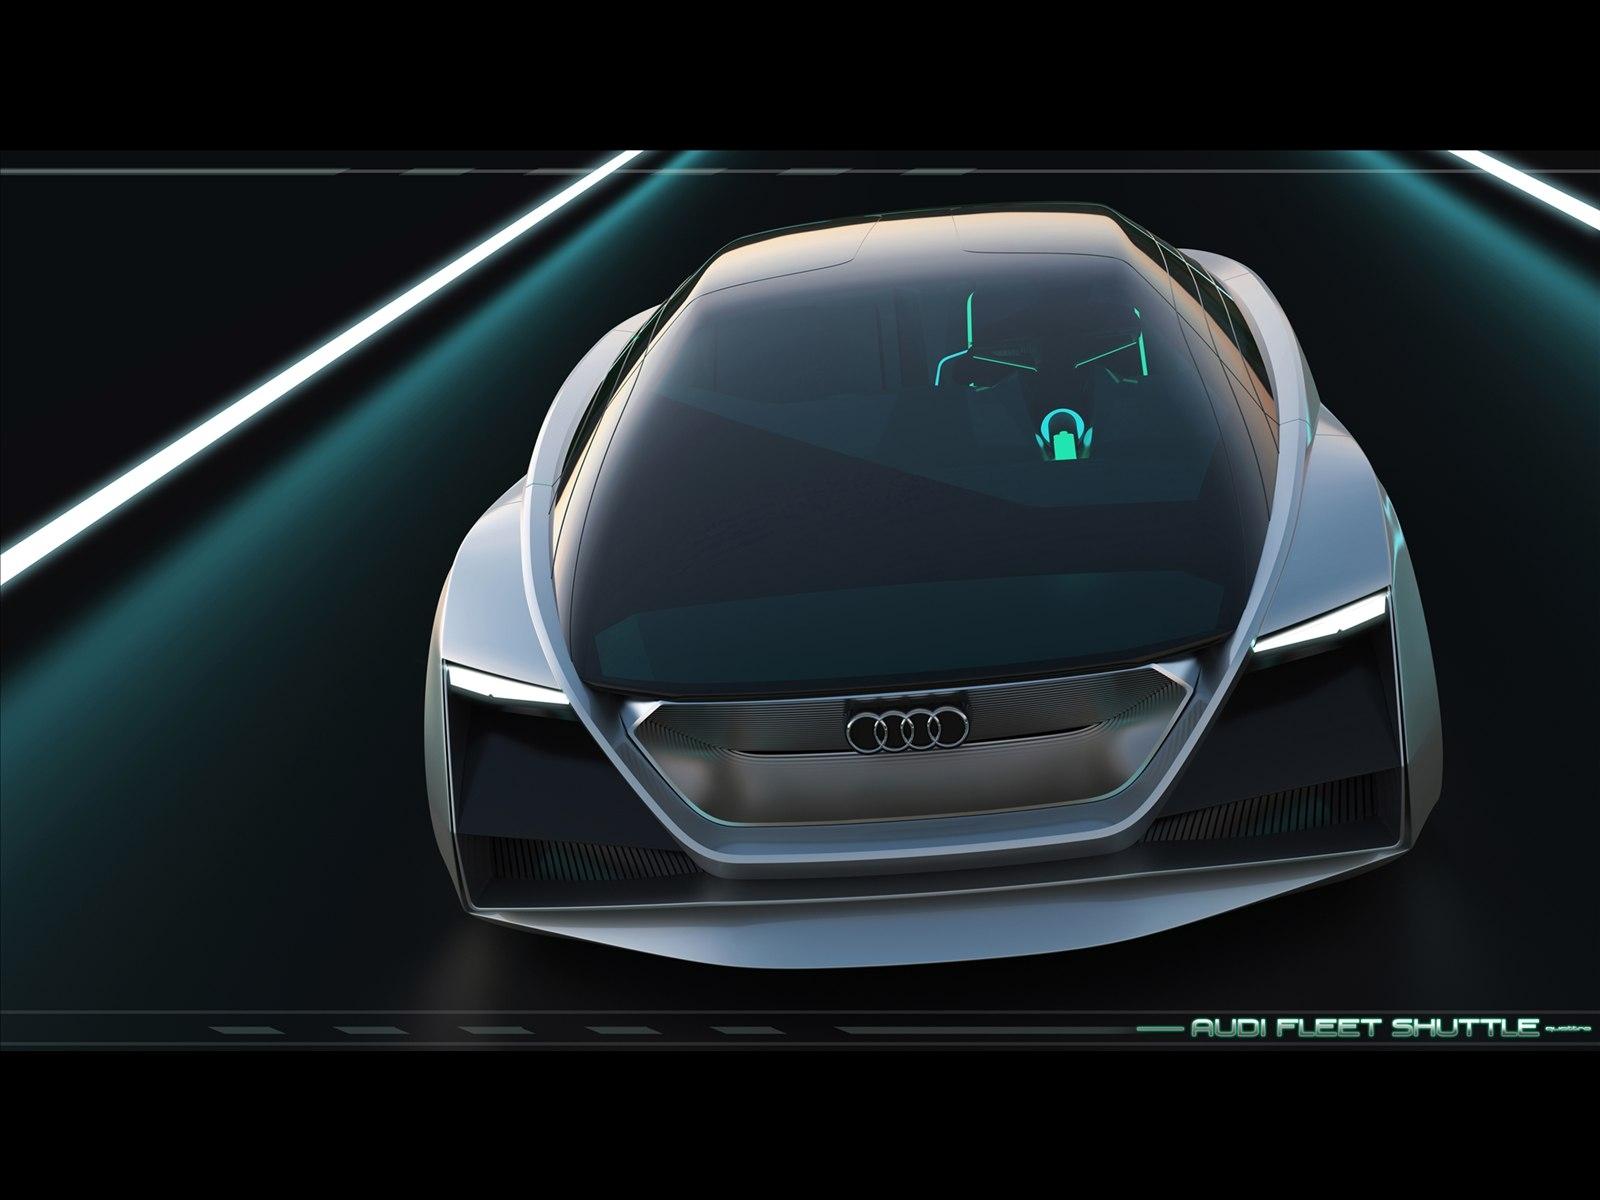 audi-fleet-shuttle-quattro-Audi-Fleet-Shuttle-Quattro-Exotic-Car-Image-O-wallpaper-wp3401098